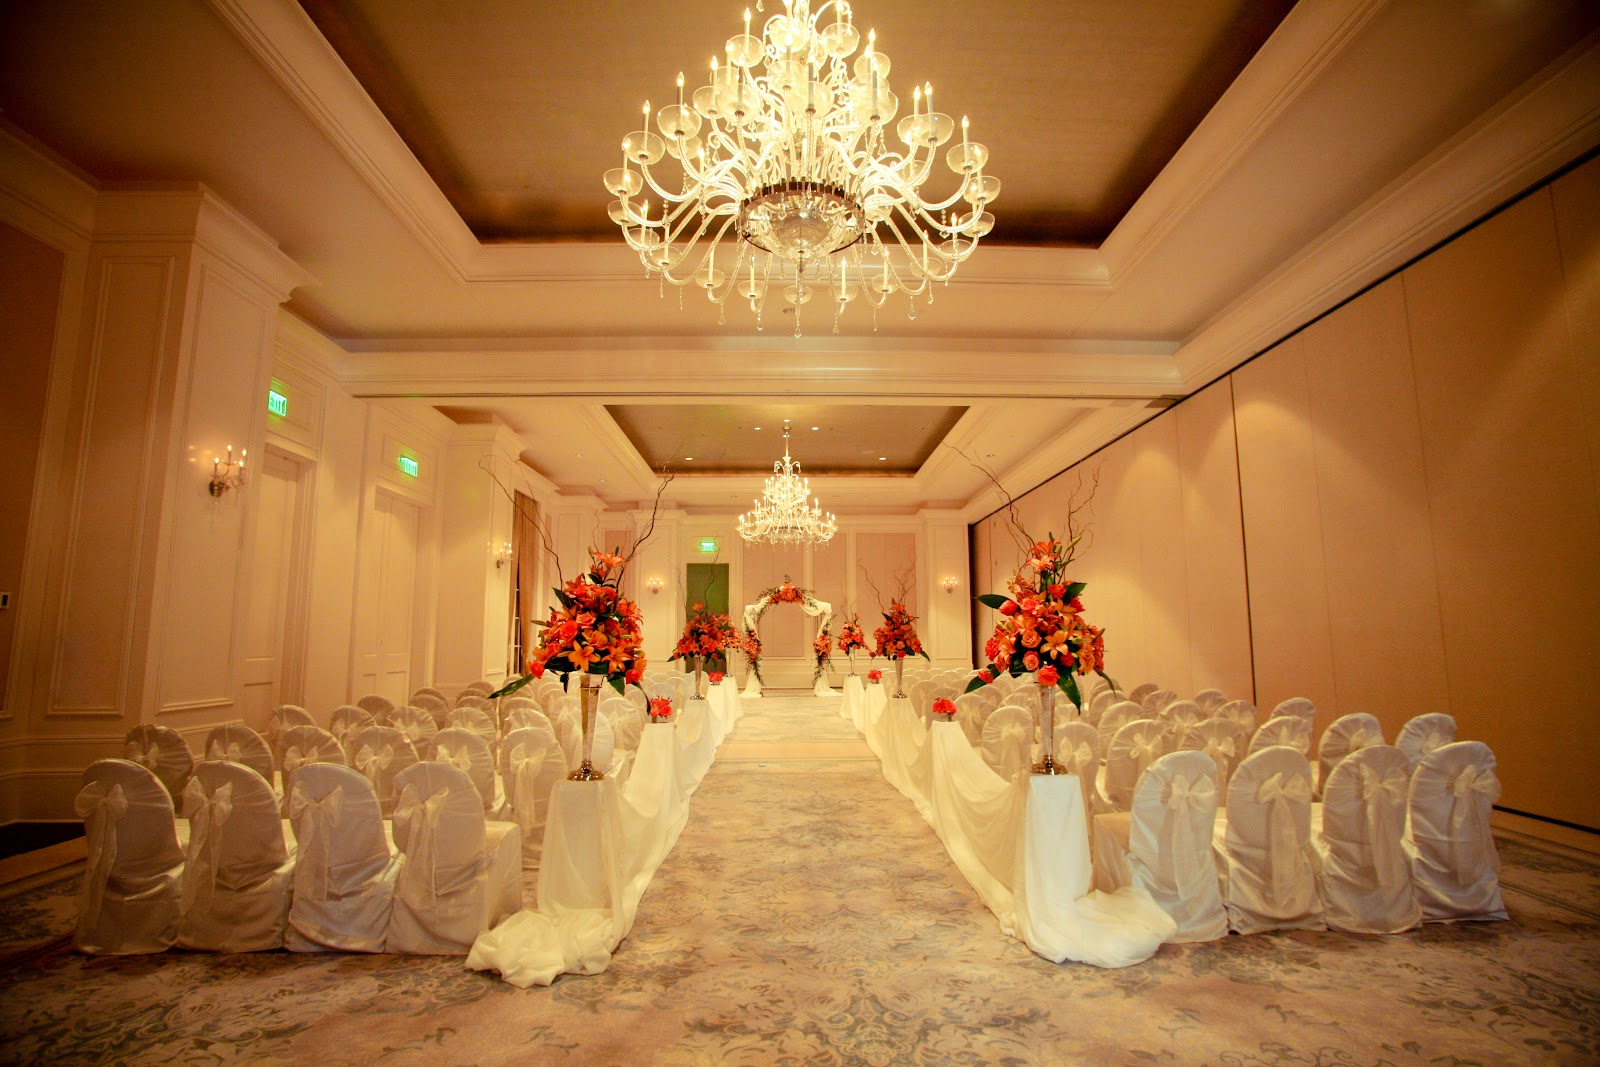 St regis wedding anik 39 s flowers for Design hotel wedding